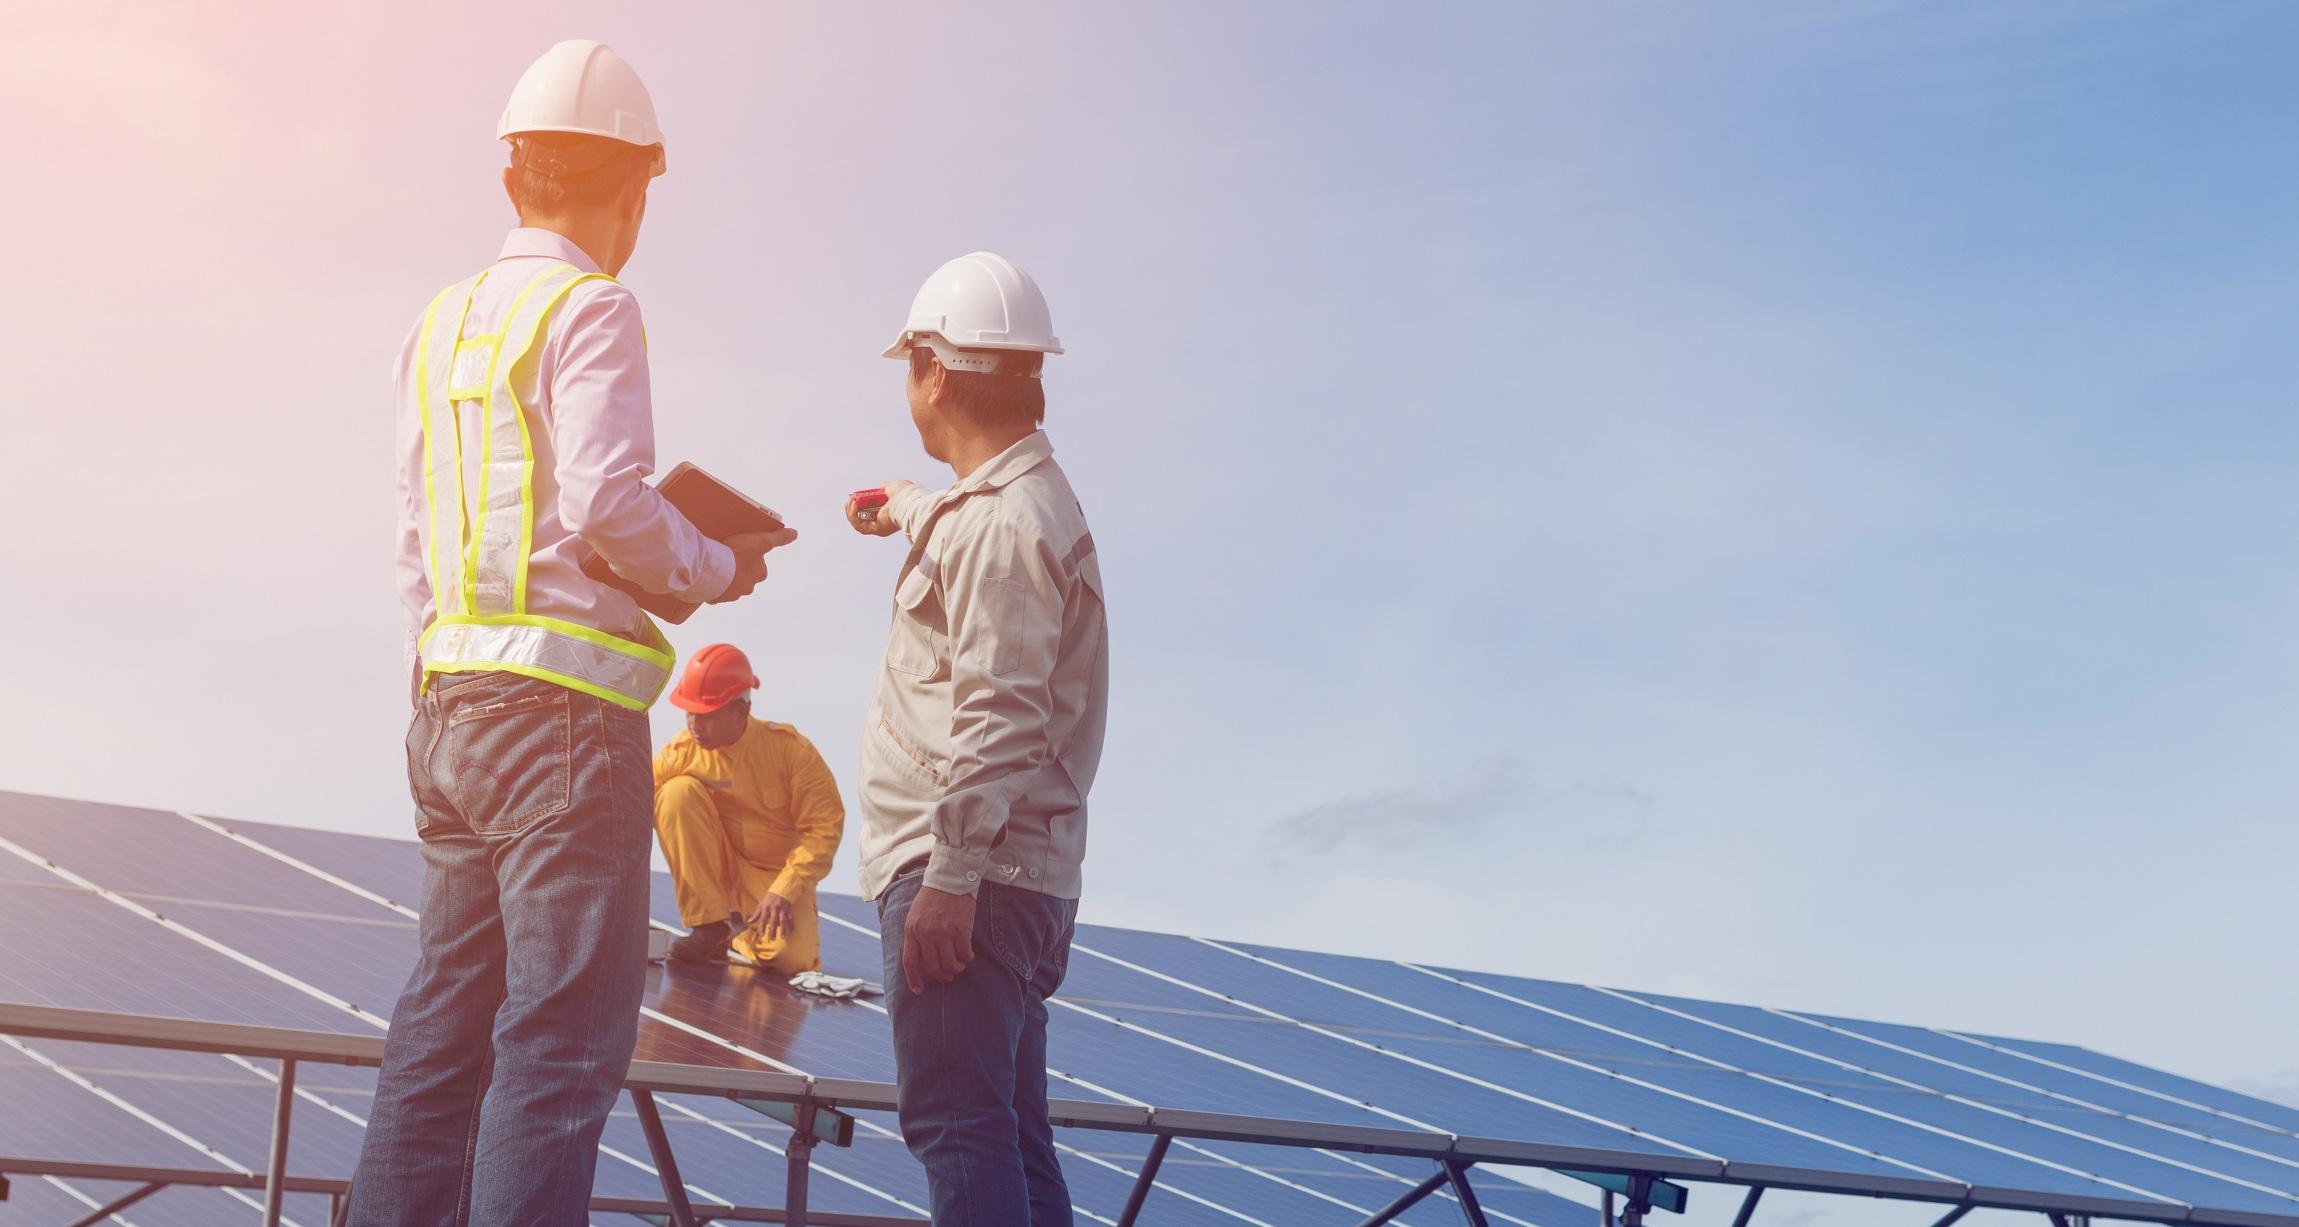 Industrial engineering jobs working on renewable energy solar